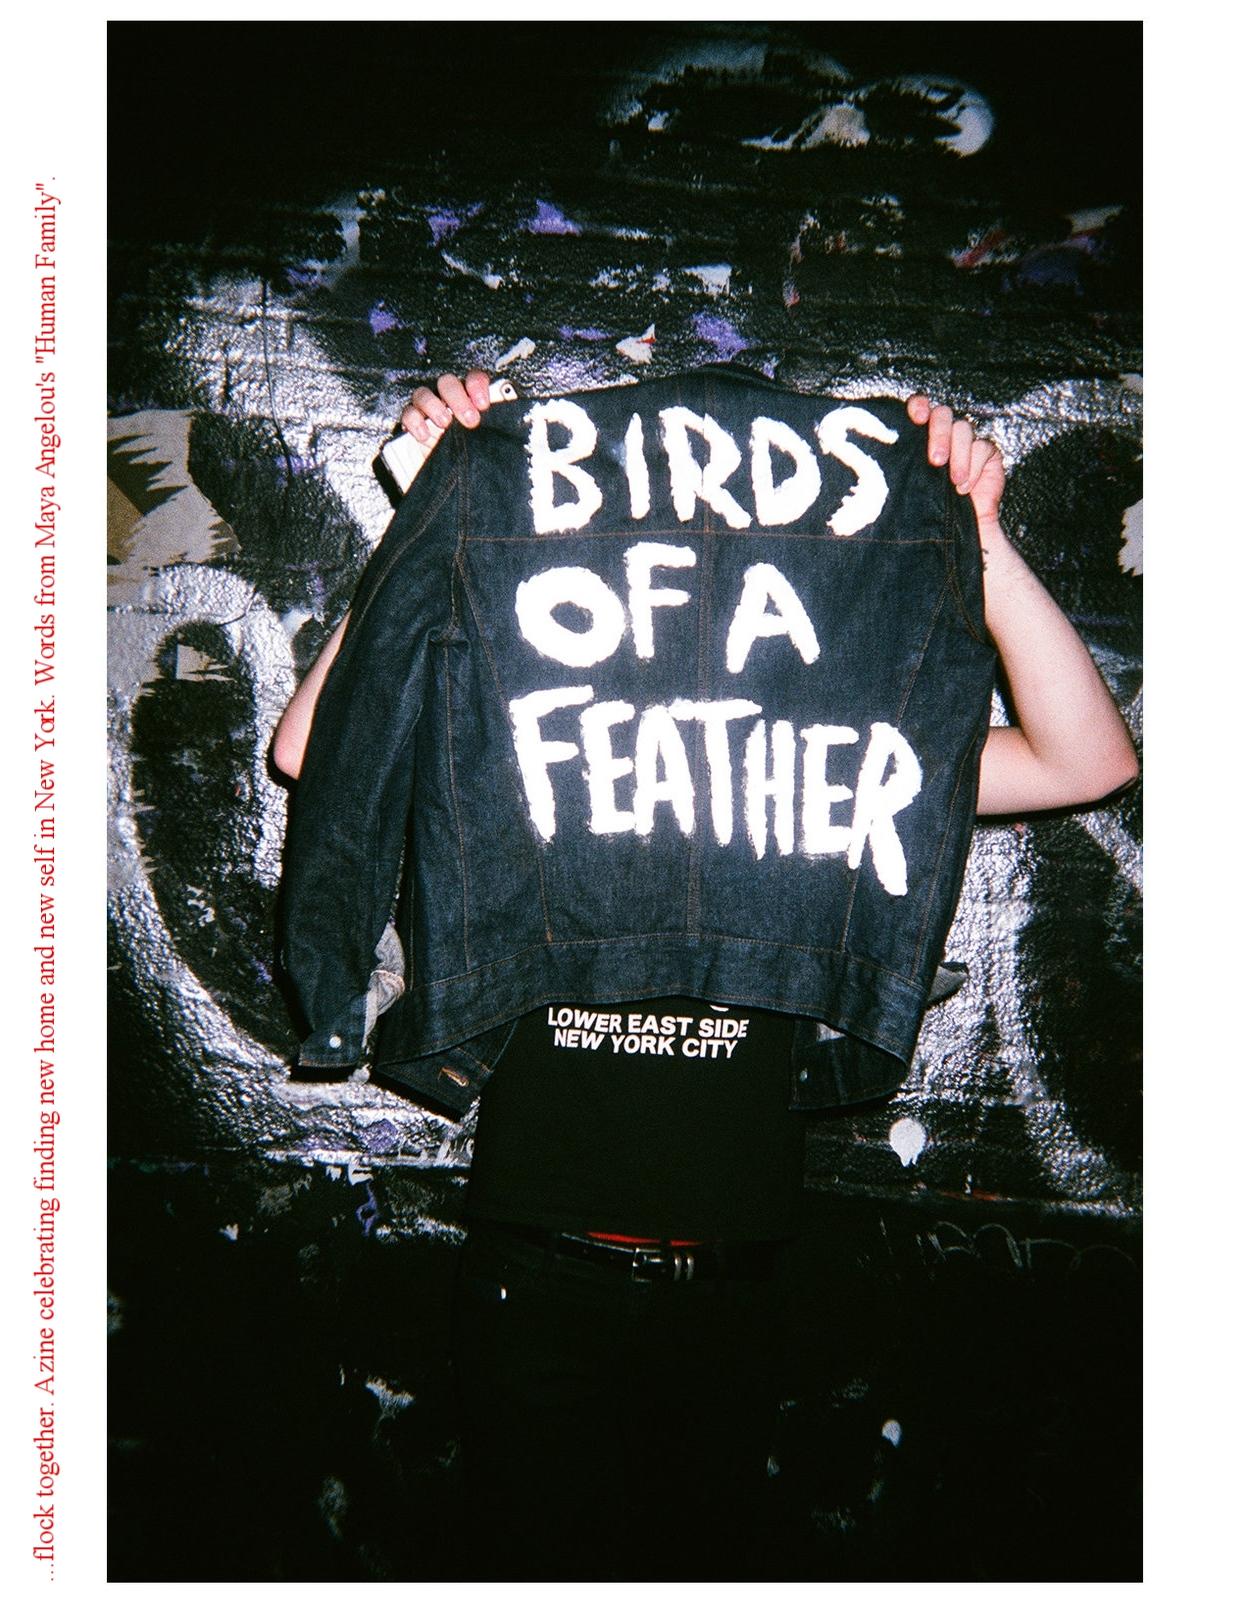 BirdsofaFeather_ZineSpreads_FINAL_01.jpg